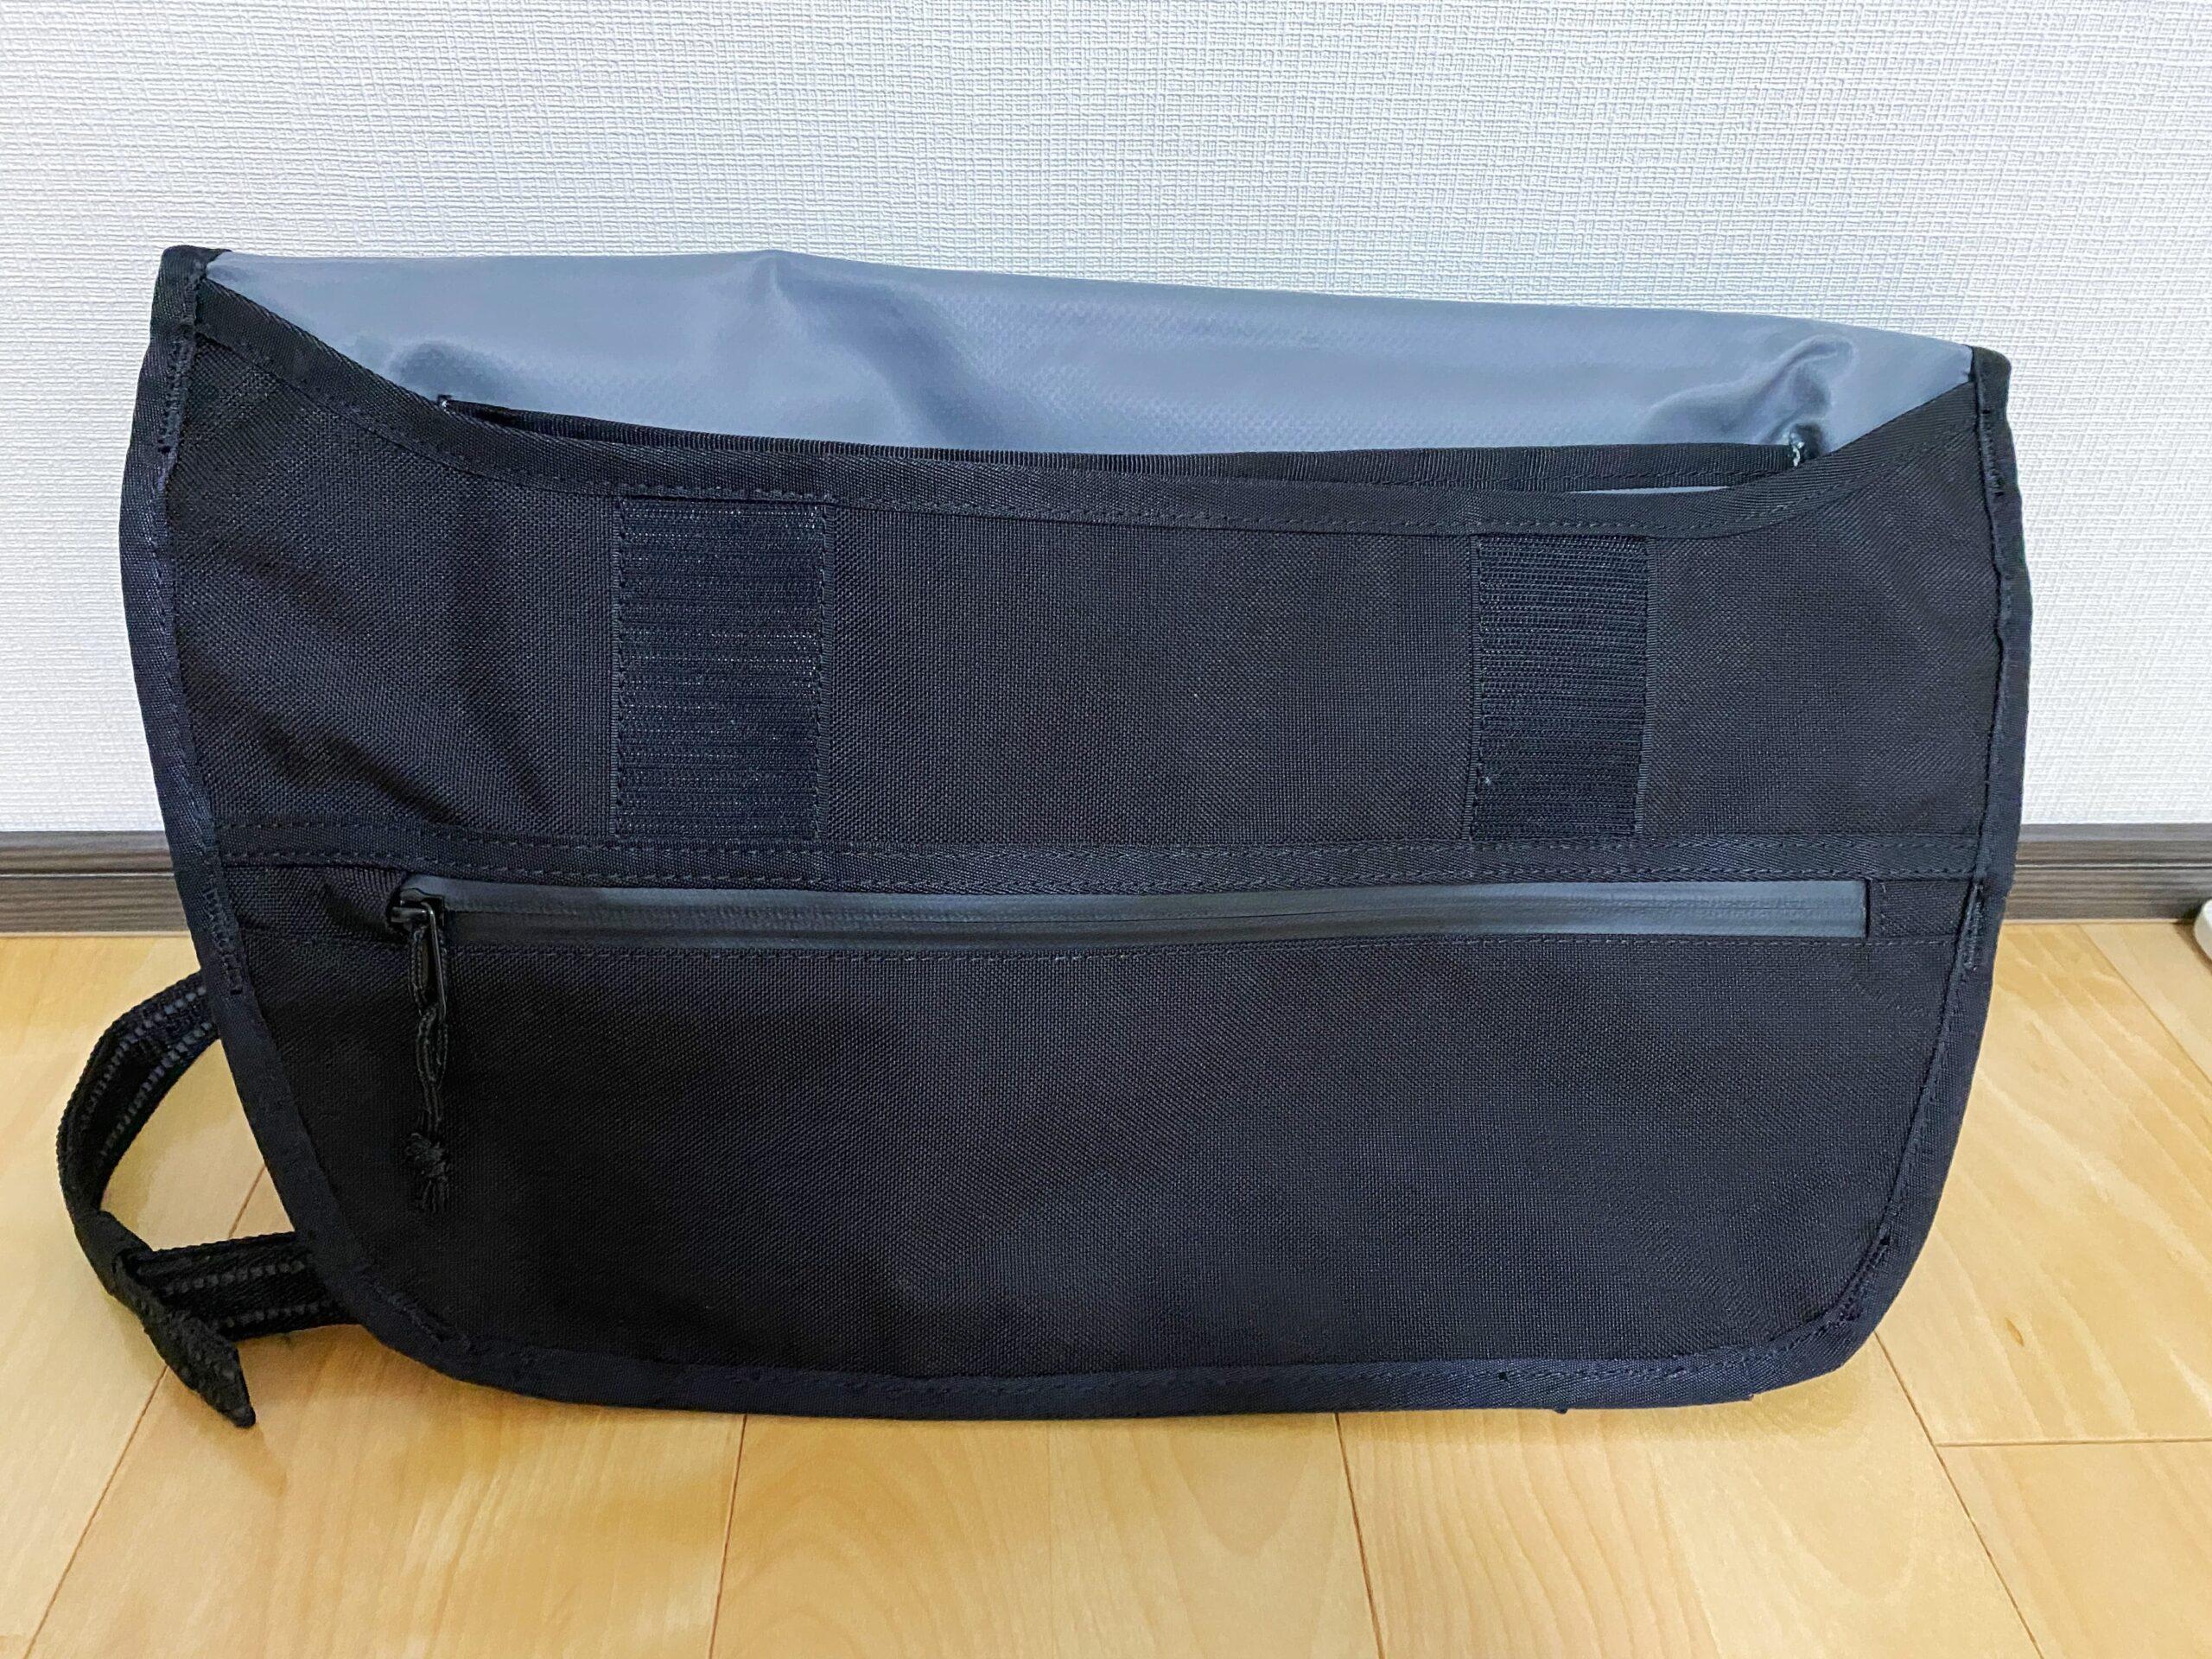 SIMPLE MESSENGER BAG ファスナー